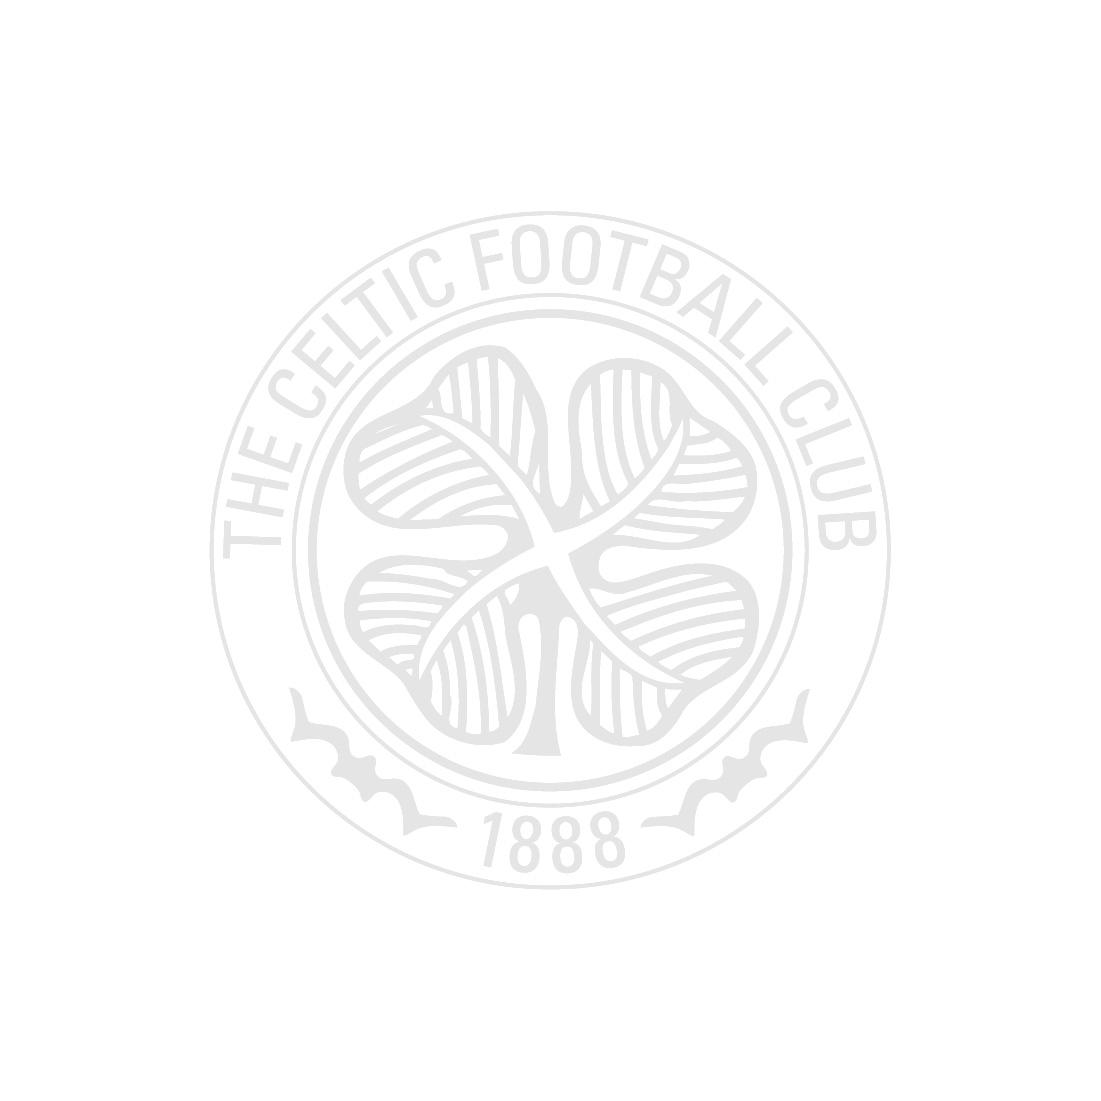 Celtic Bar Scarf 100g Chocolate Bar